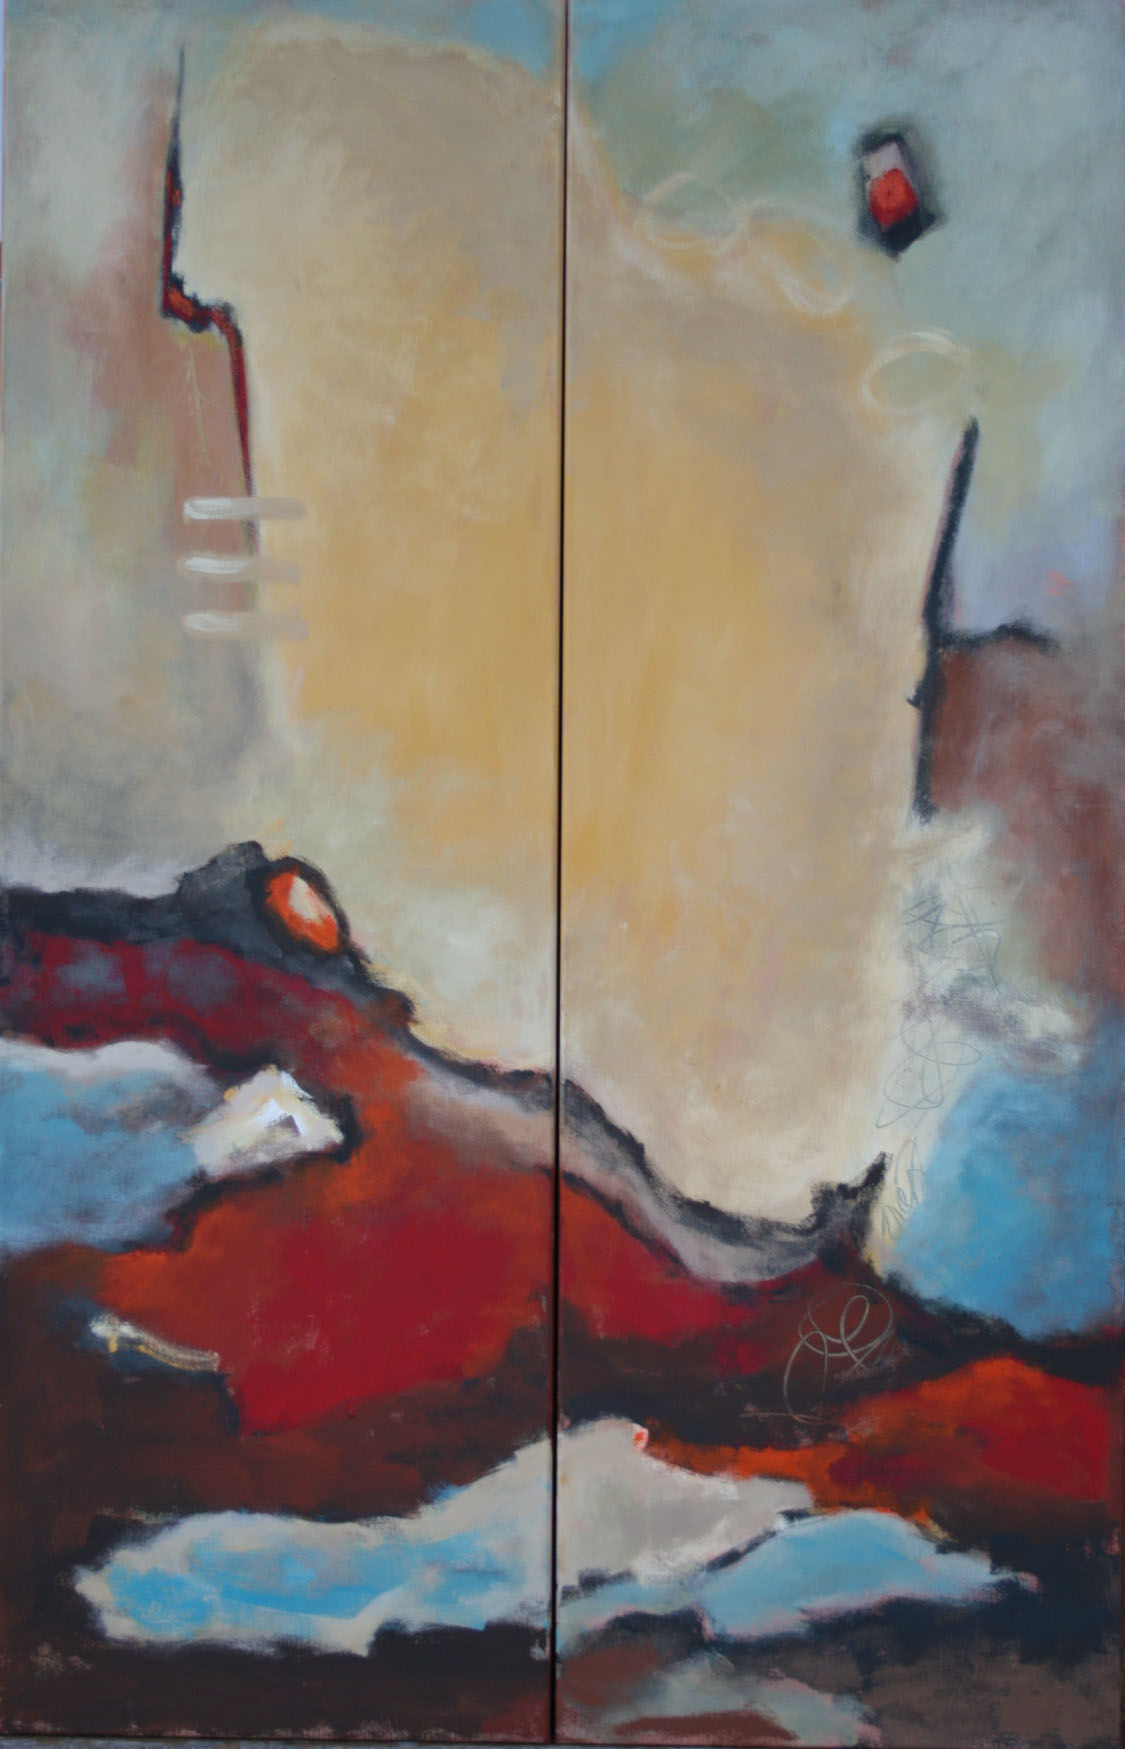 Aufwärts, Öl und Acryl auf Leinwand,  2-tlg,  je 140 x 45 cm